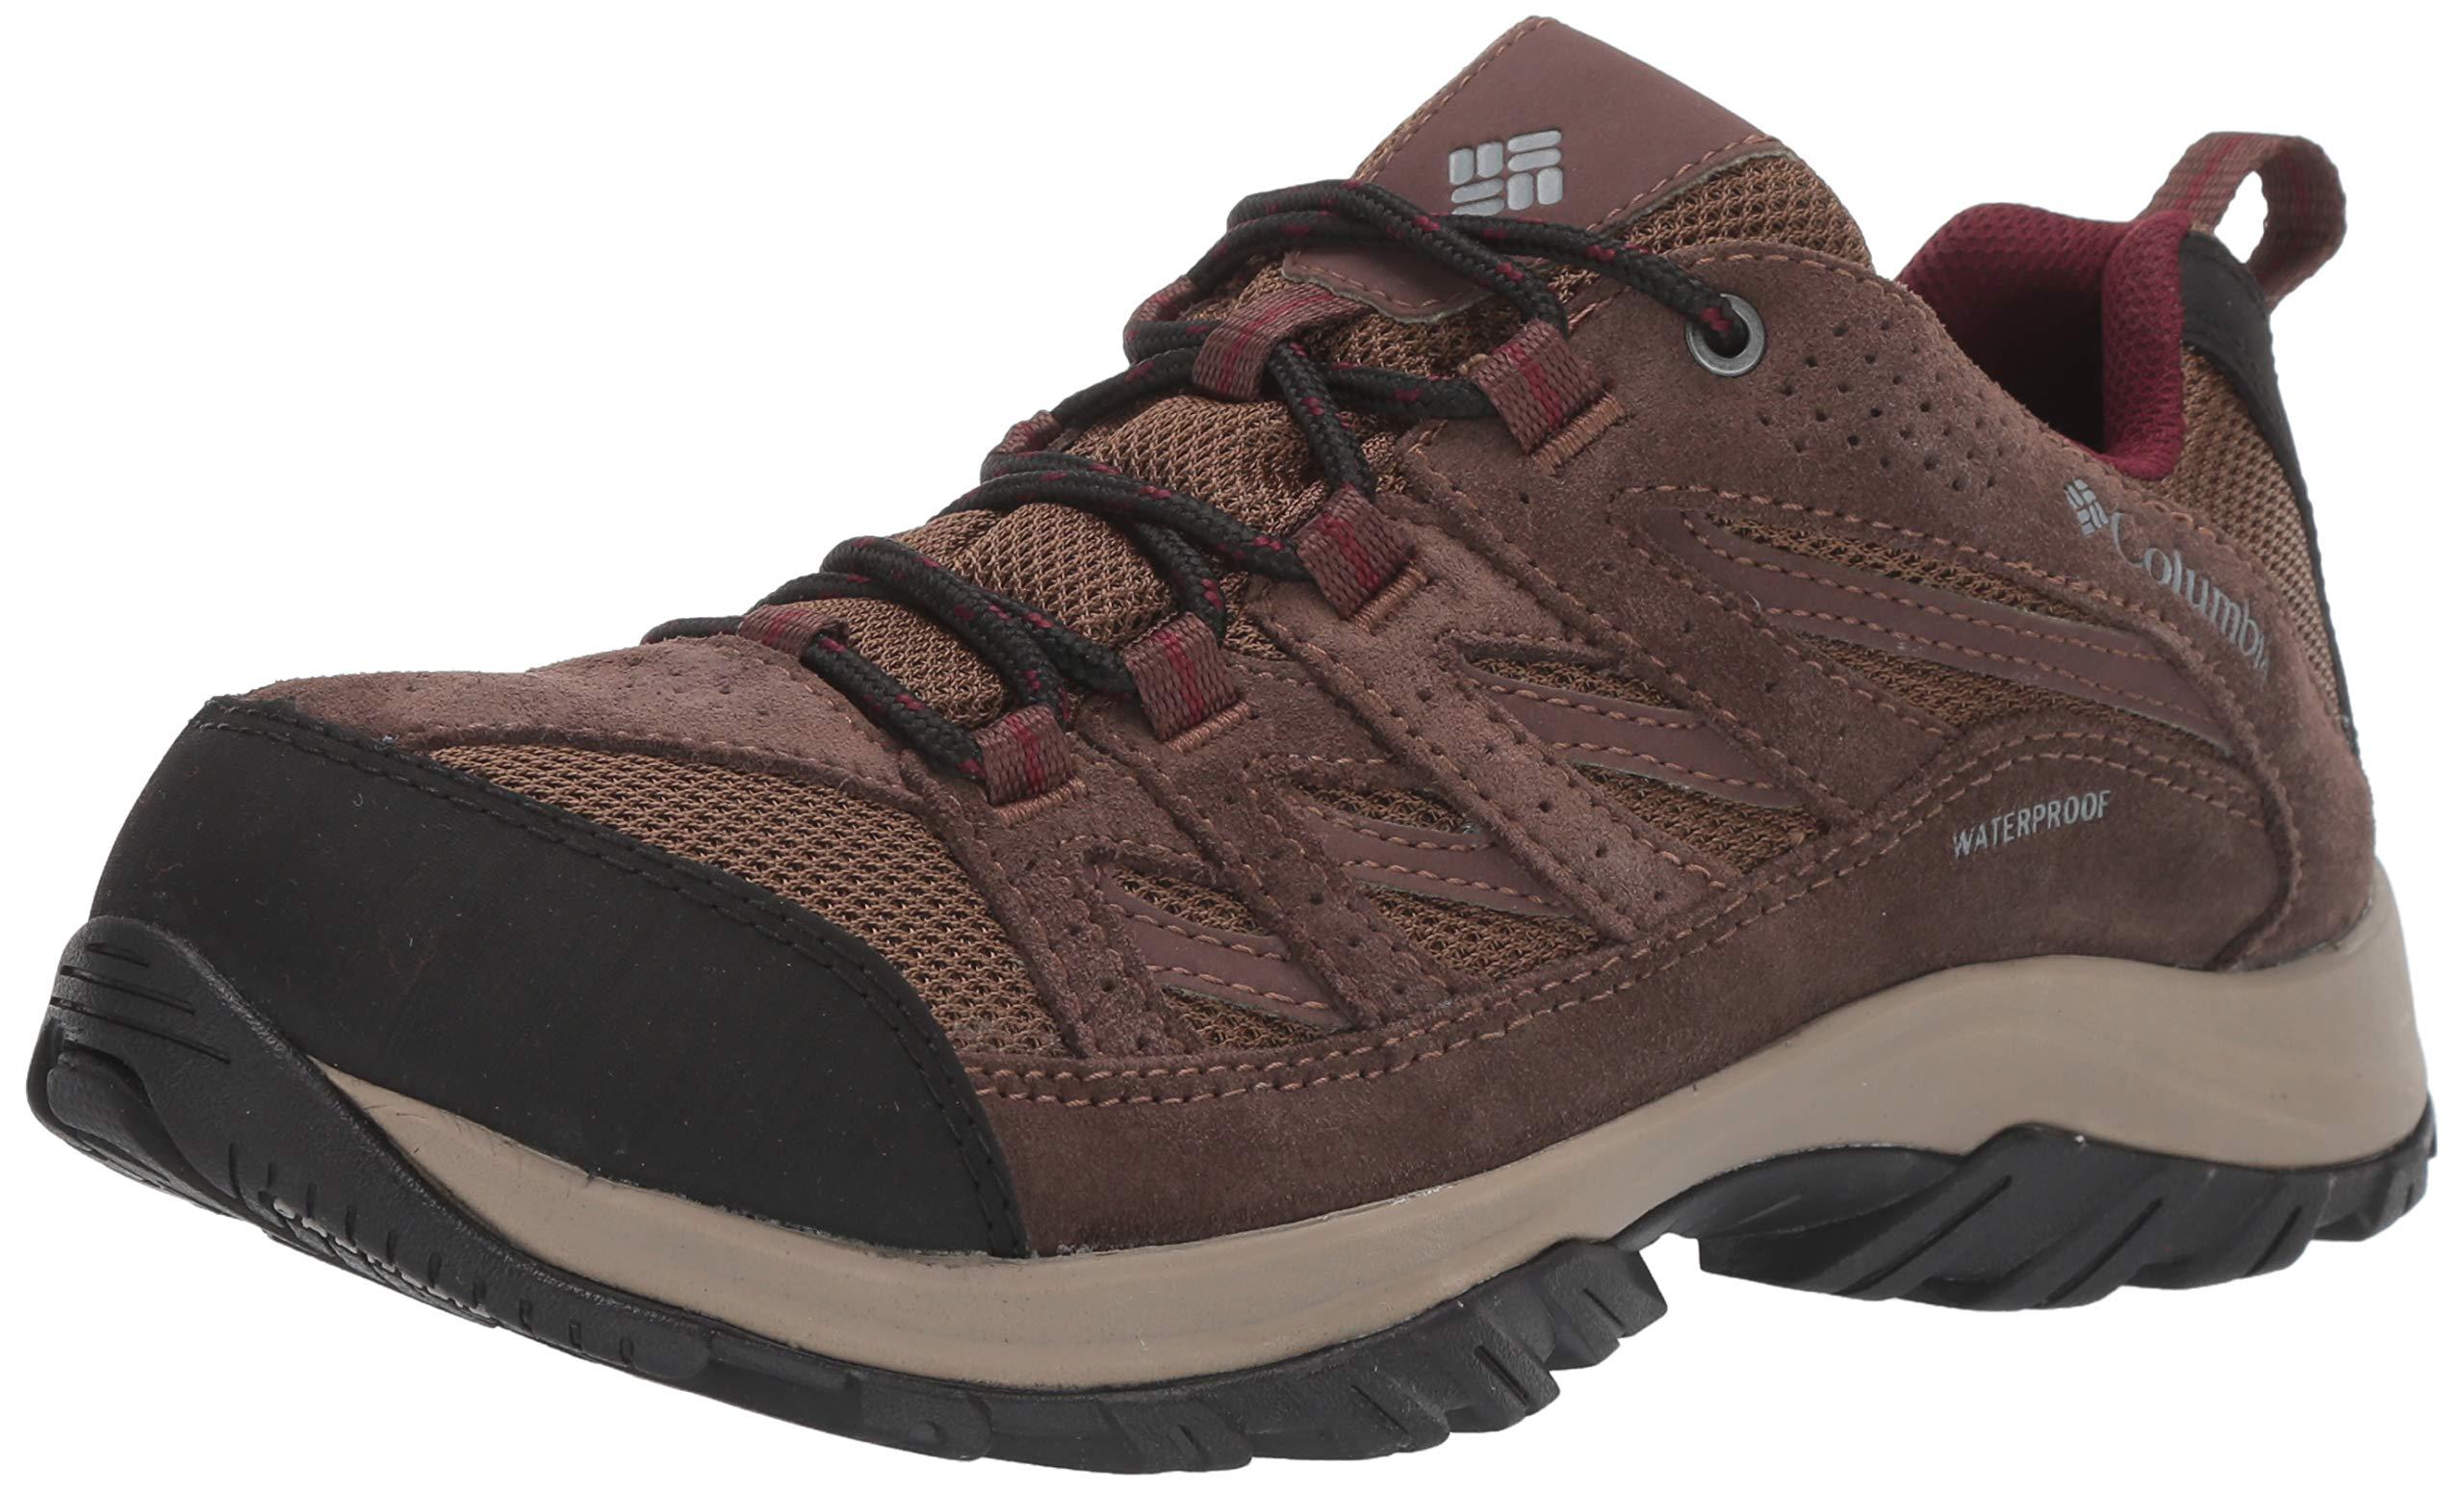 Columbia Women's Crestwood Waterproof Hiking Shoe, Dark Truffle, Rich Wine, 6.5 Regular US by Columbia